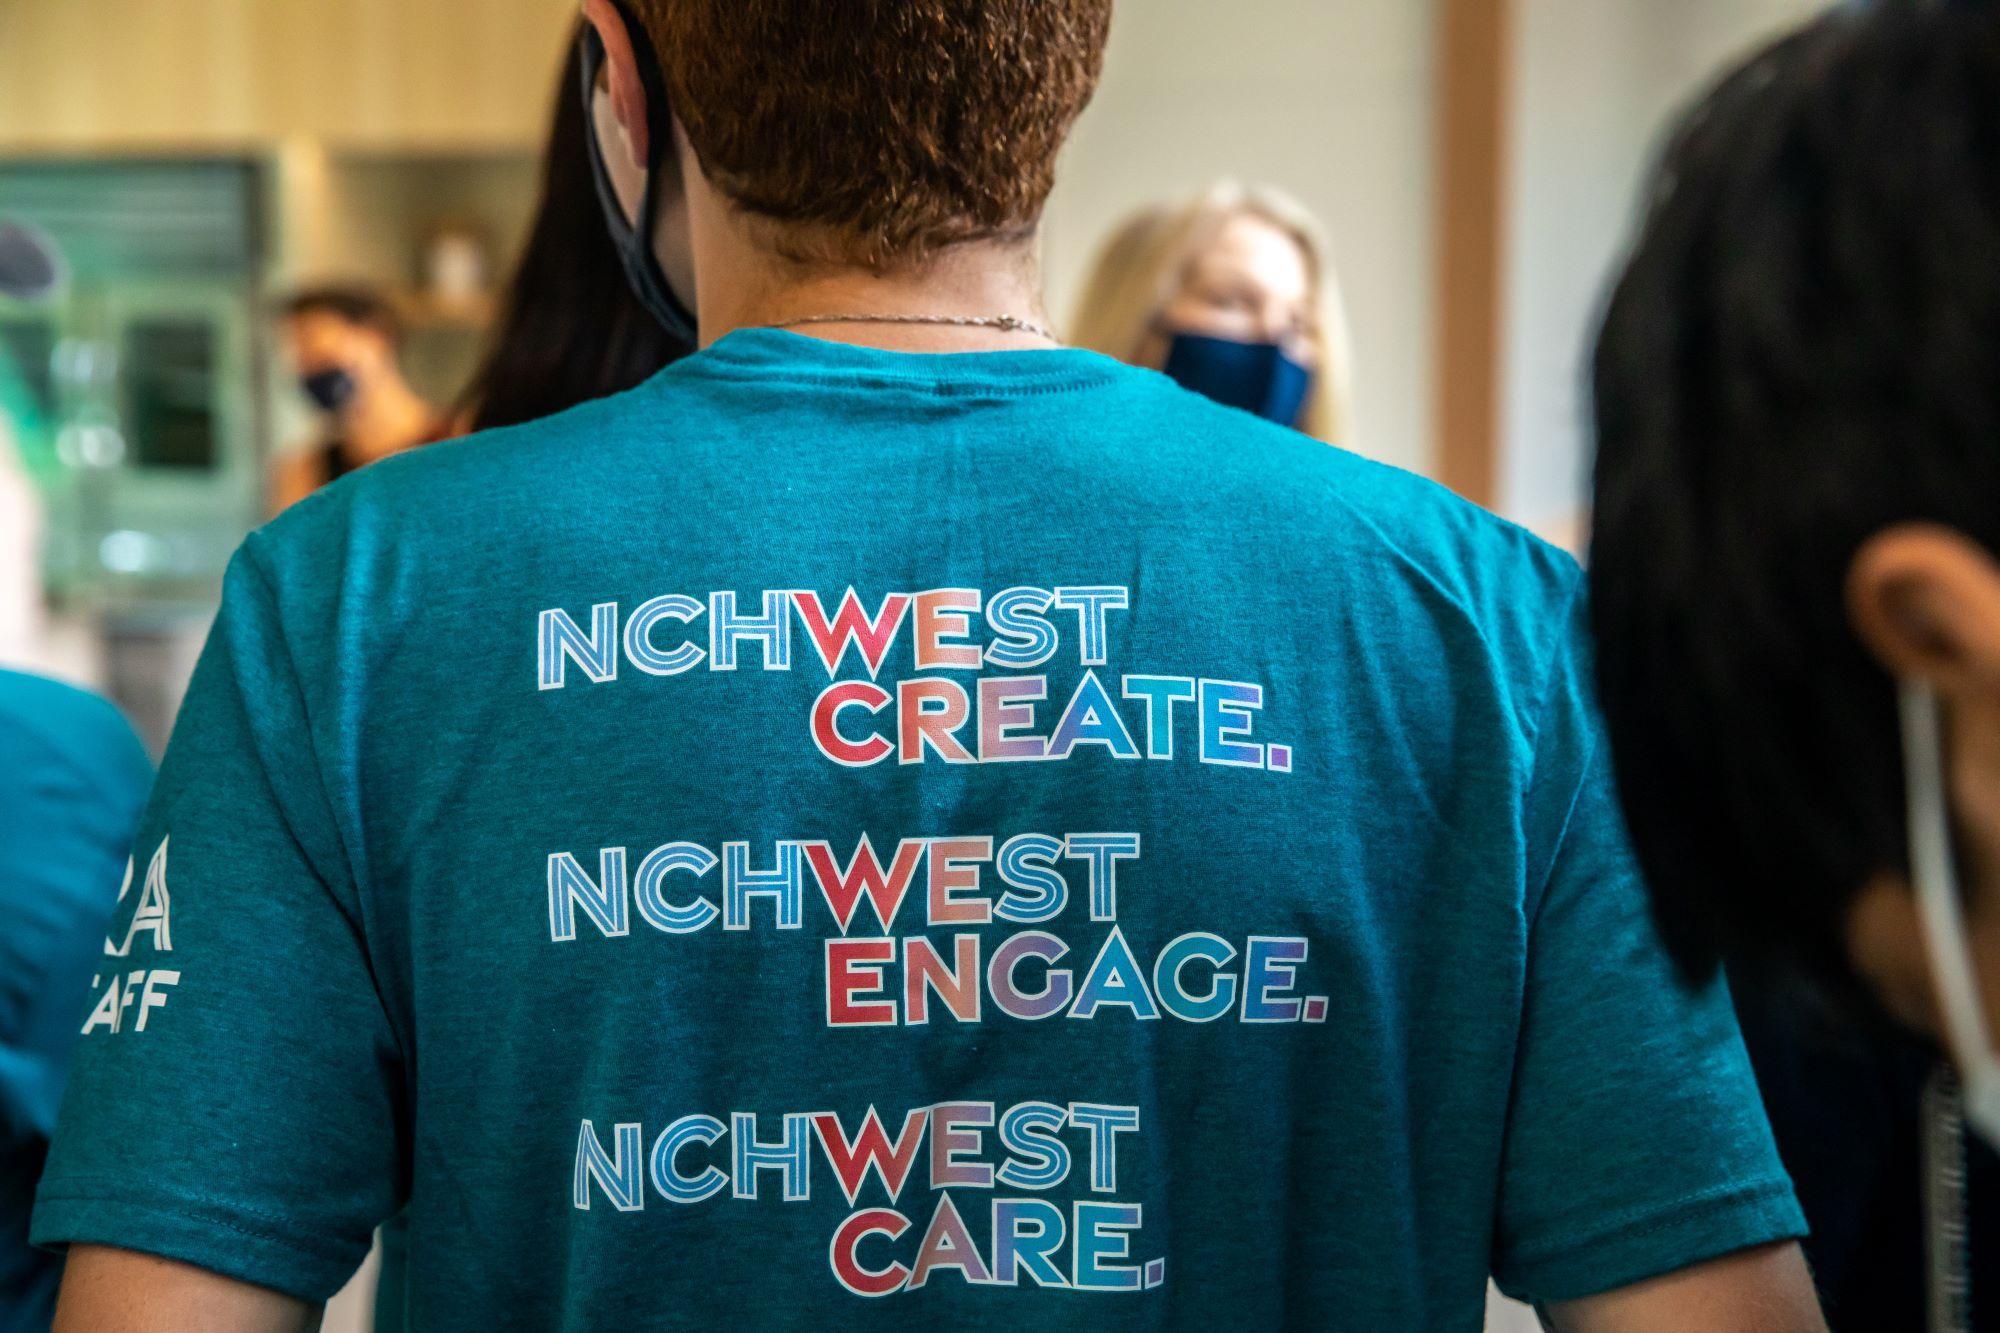 Back of T-shirt that reads NCHWest Create, NCHWest Engage, NCHWest Care